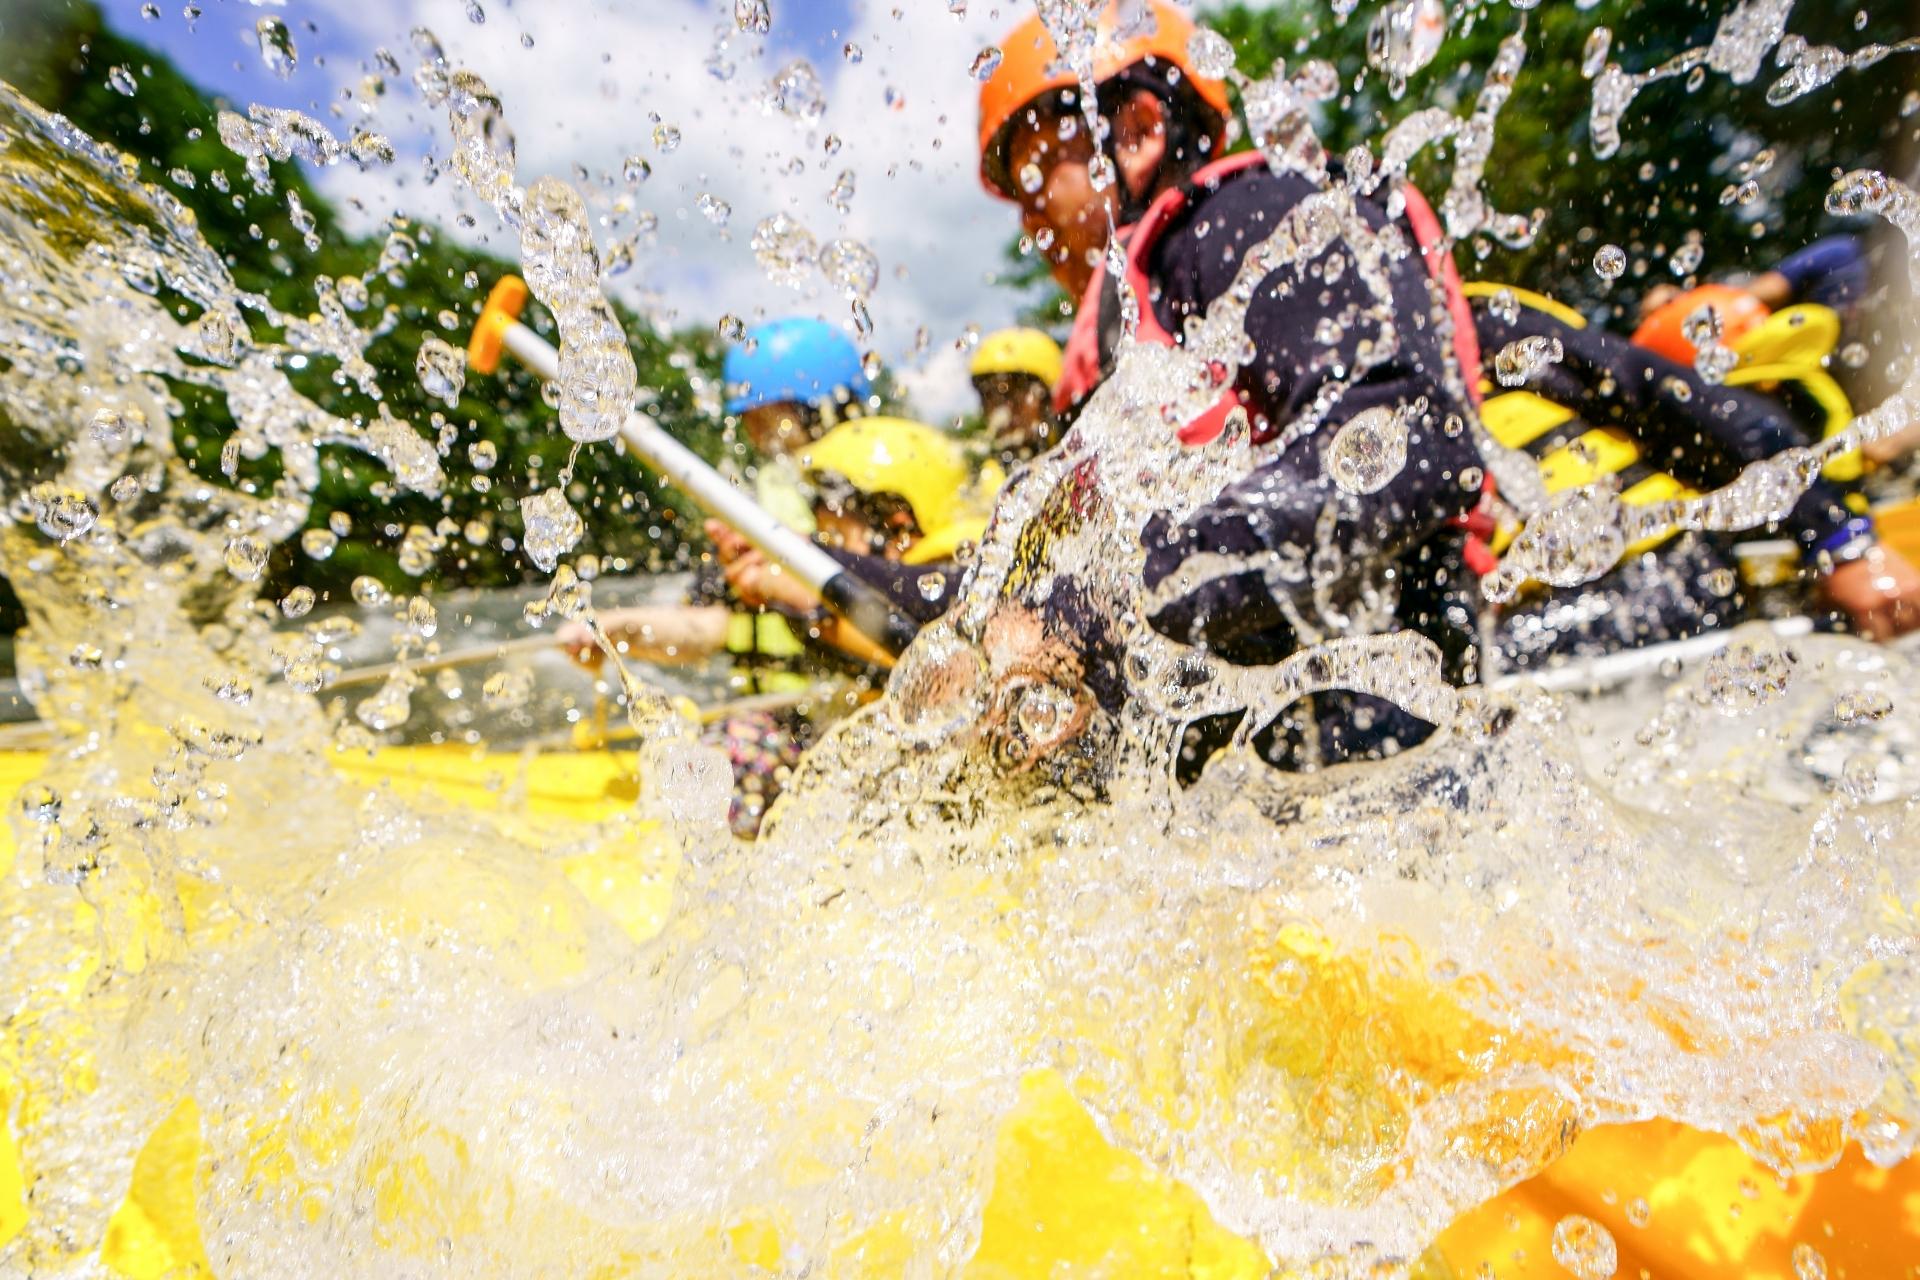 Water activity in nagano